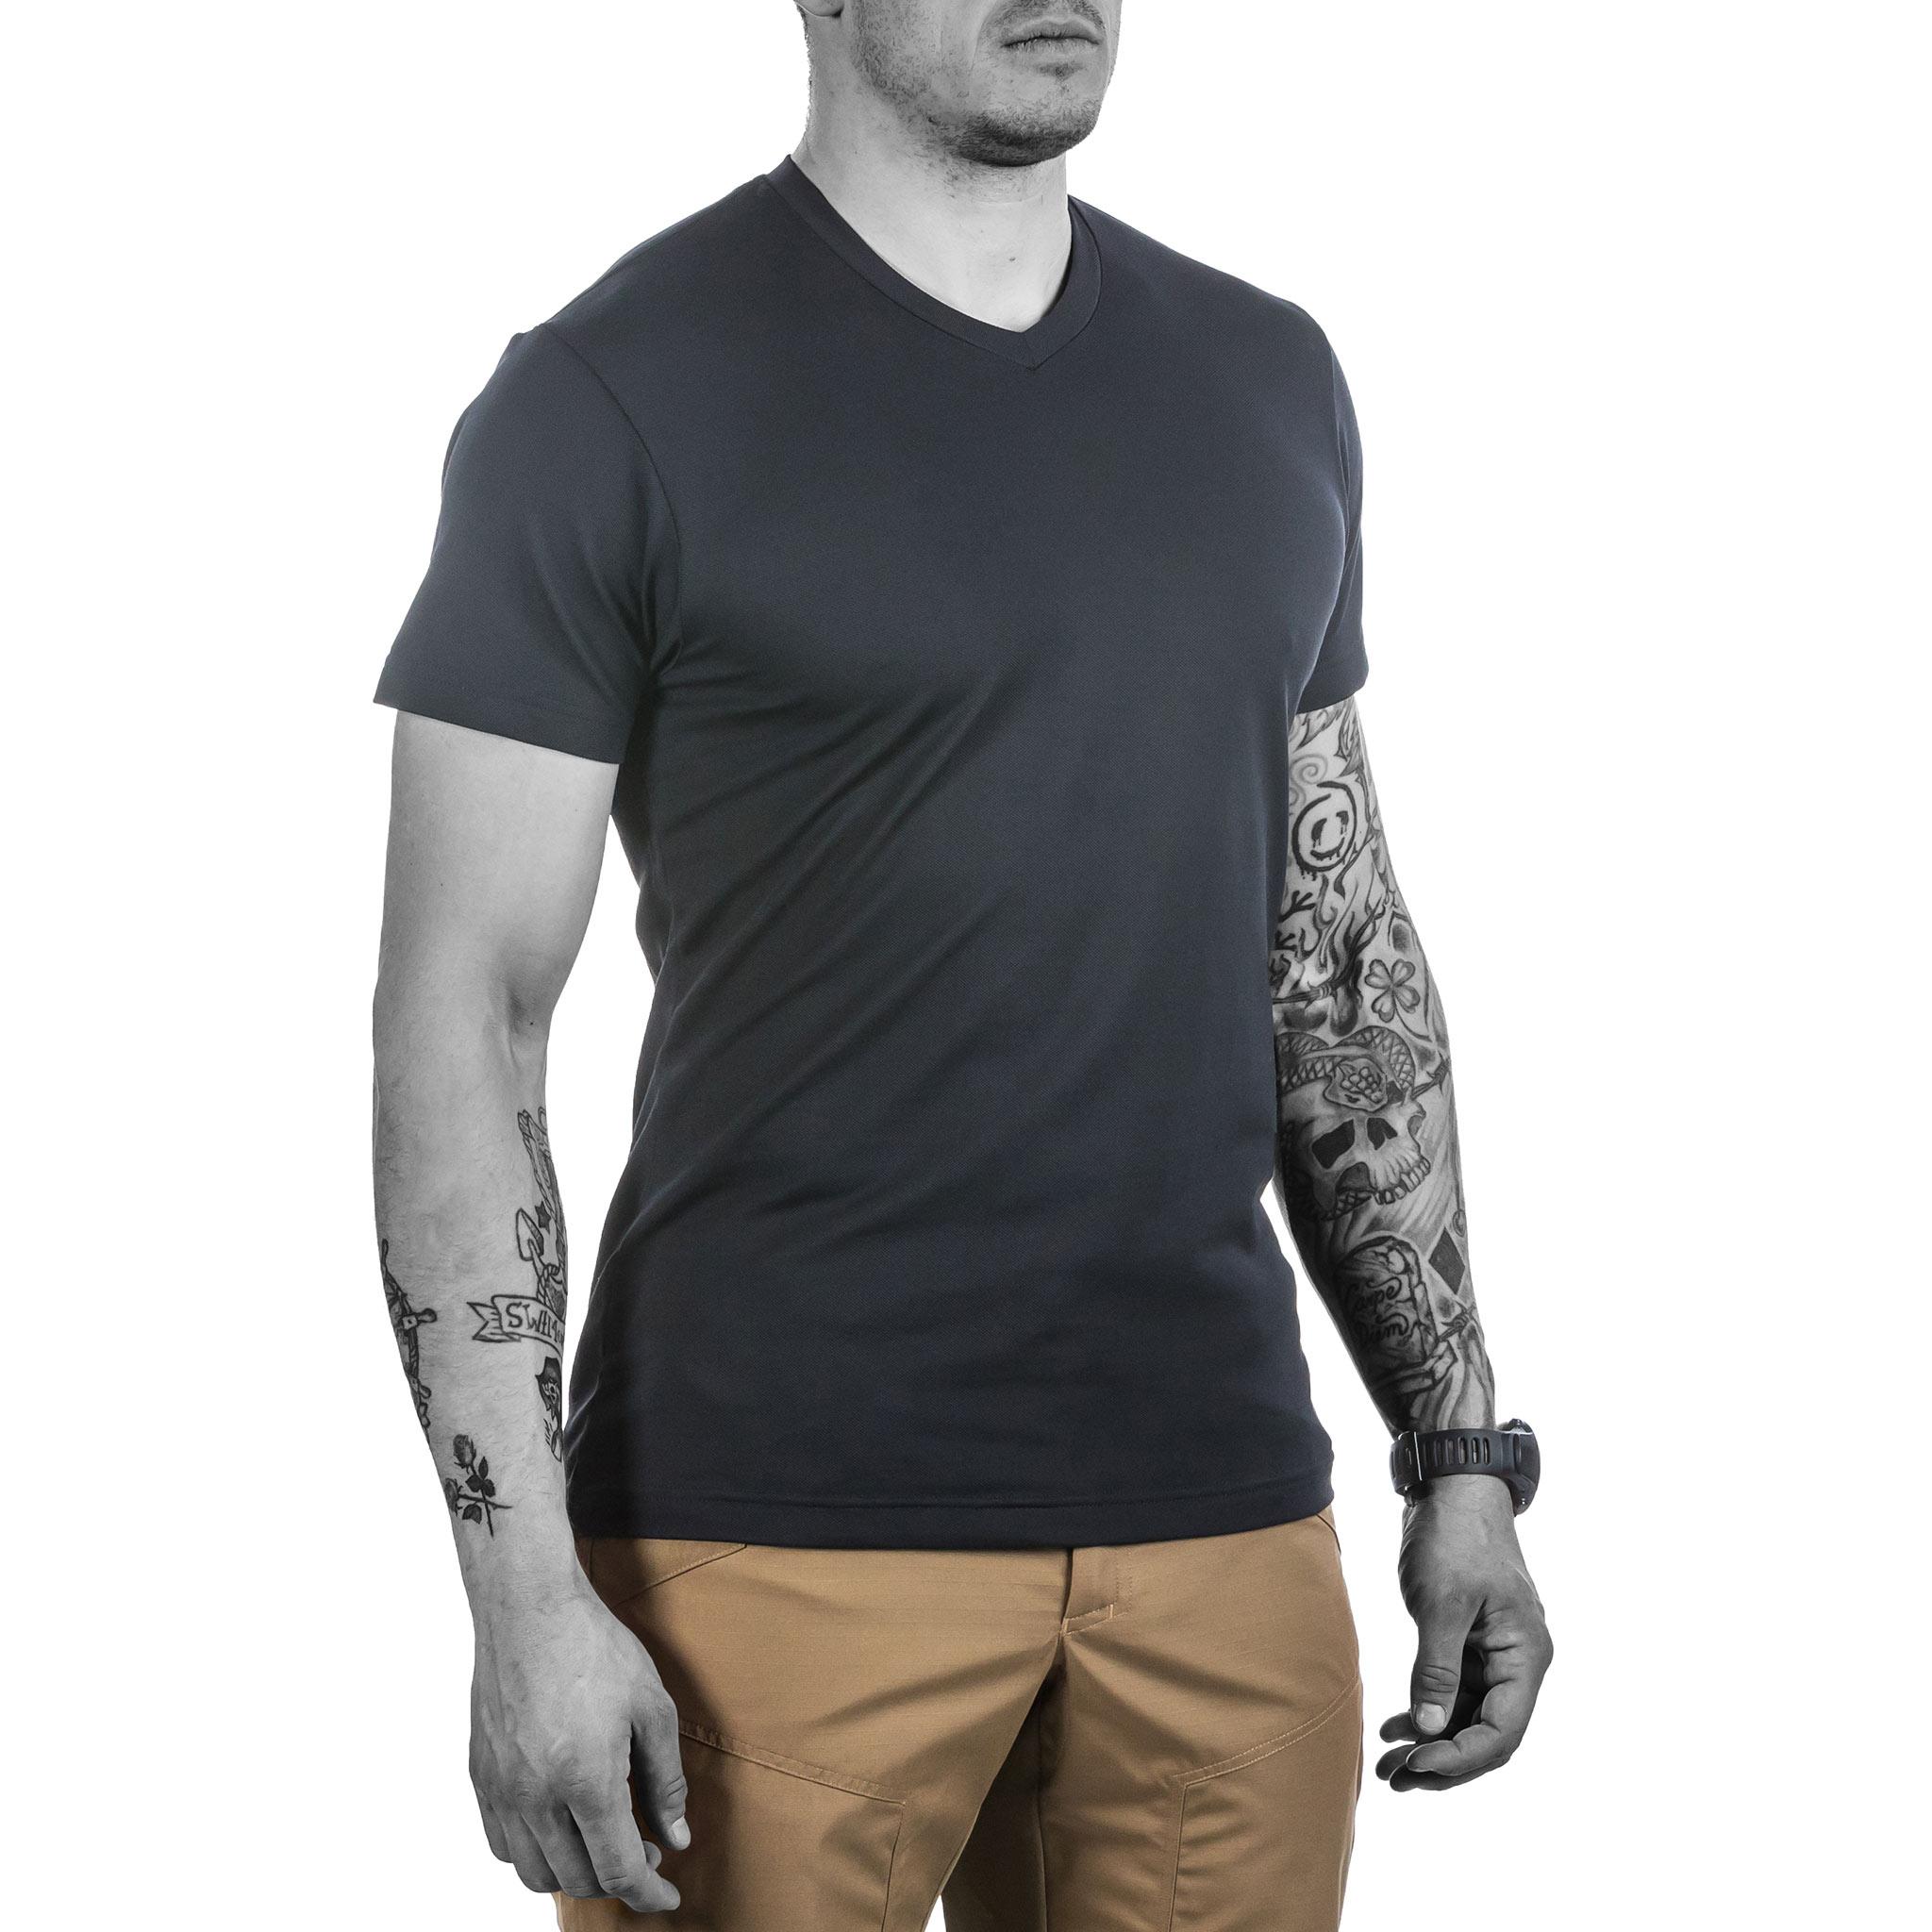 competitive price 86927 9890c Urban T-Shirt